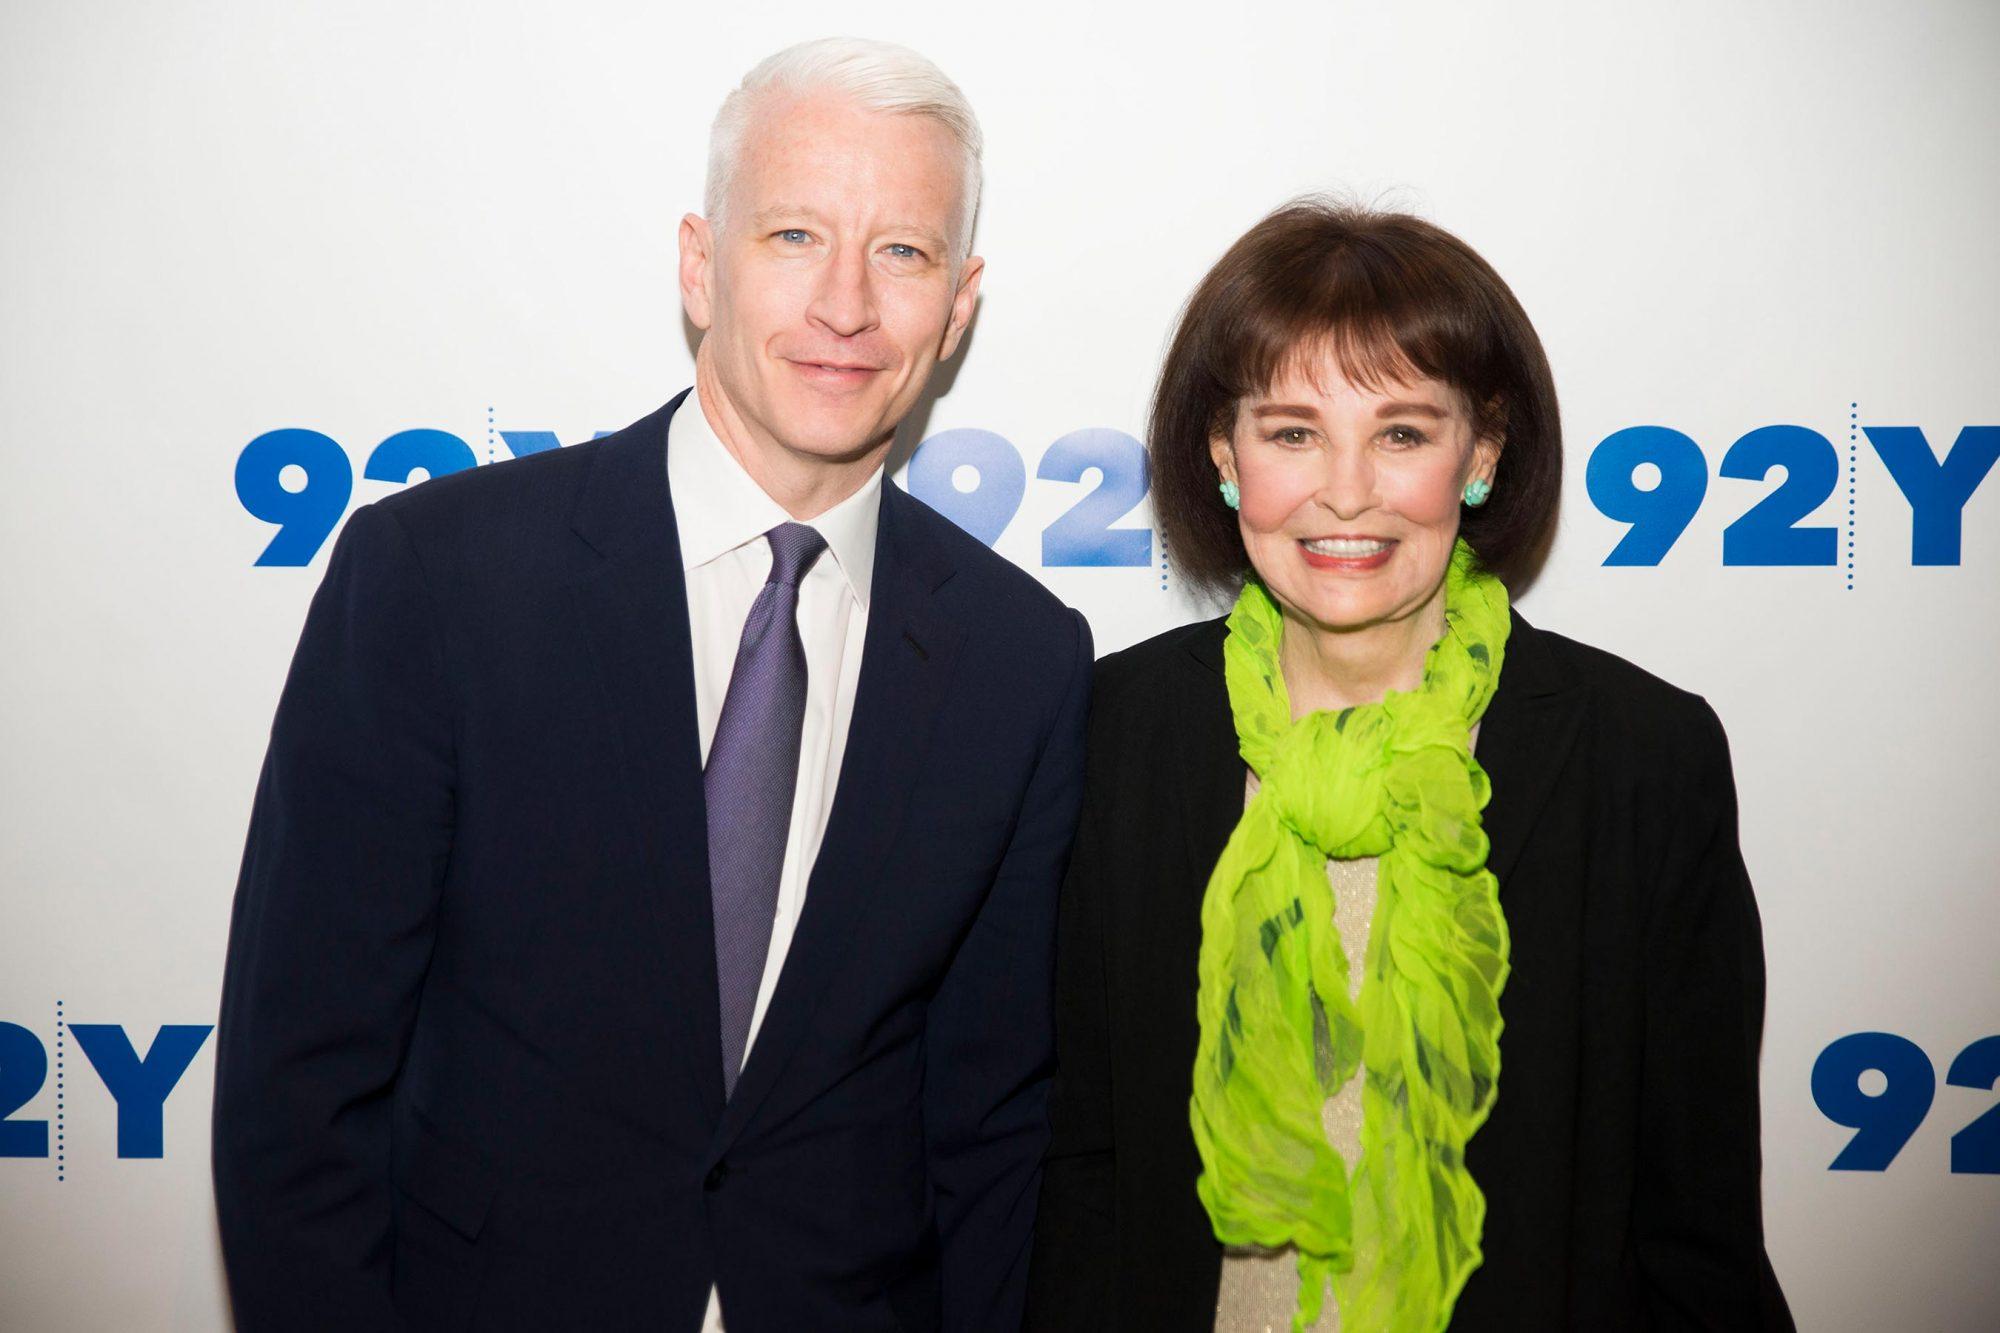 A Conversation With Anderson Cooper And Gloria Vanderbilt